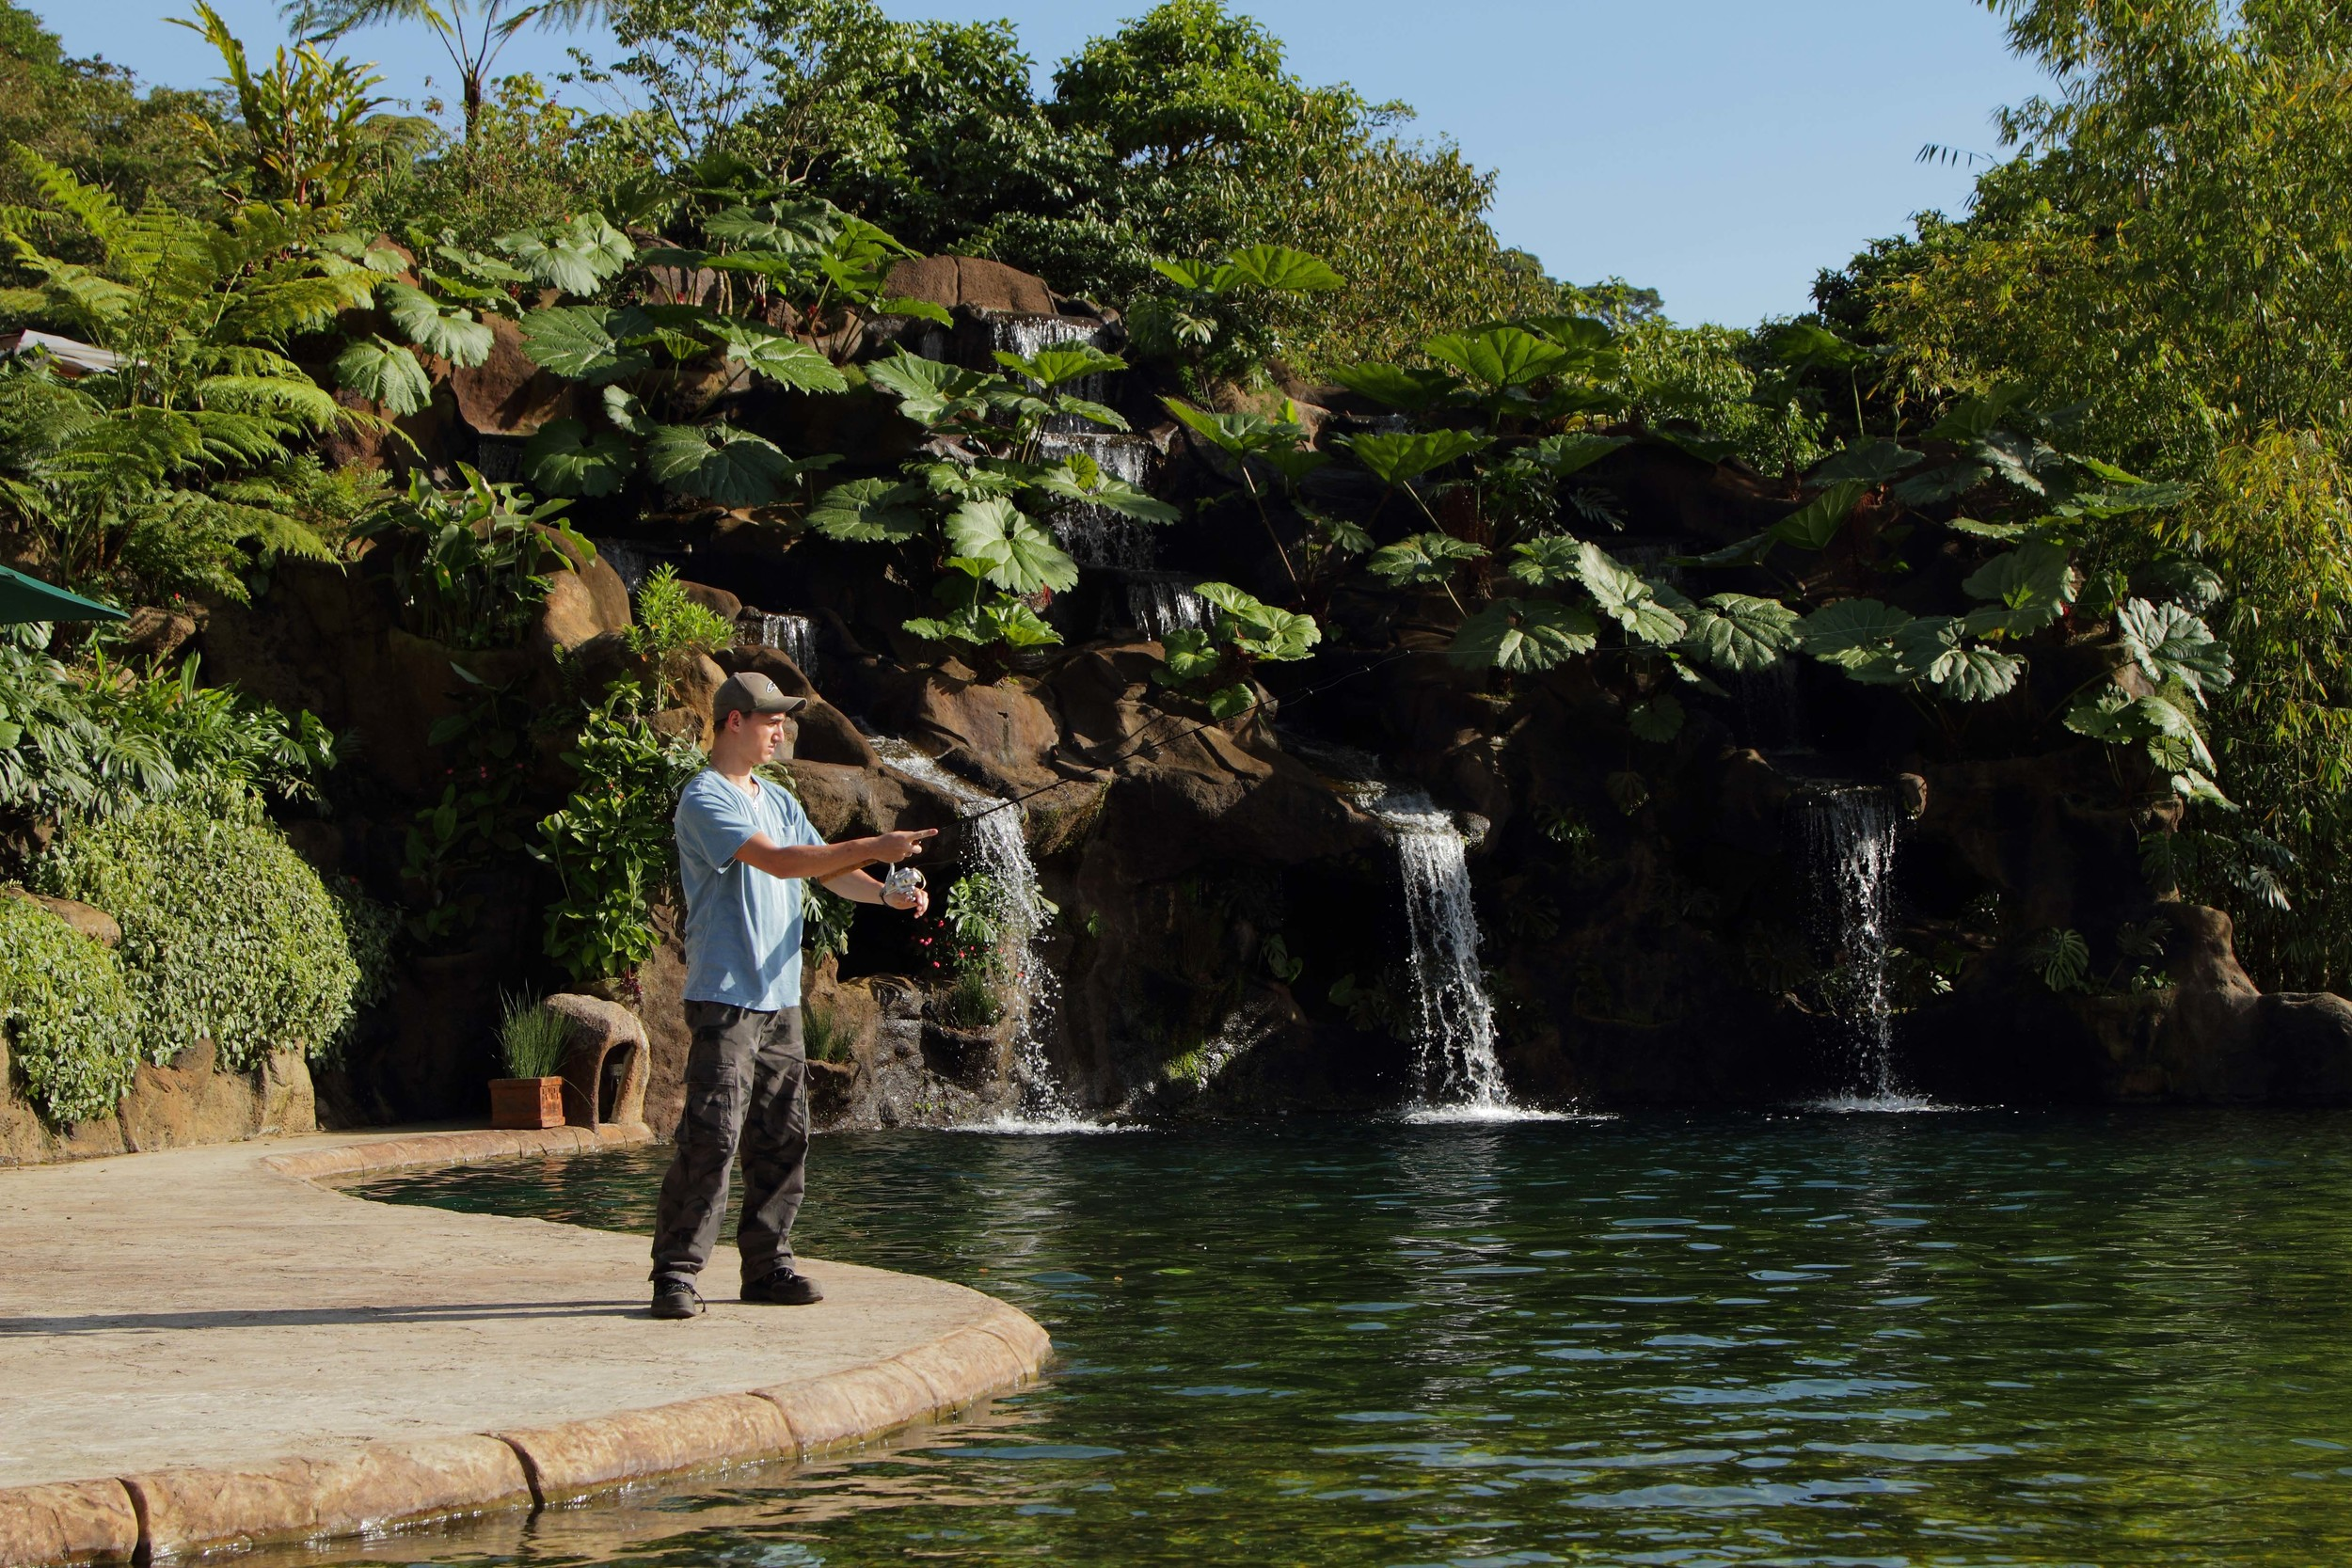 waterfall-gardens-04.jpg